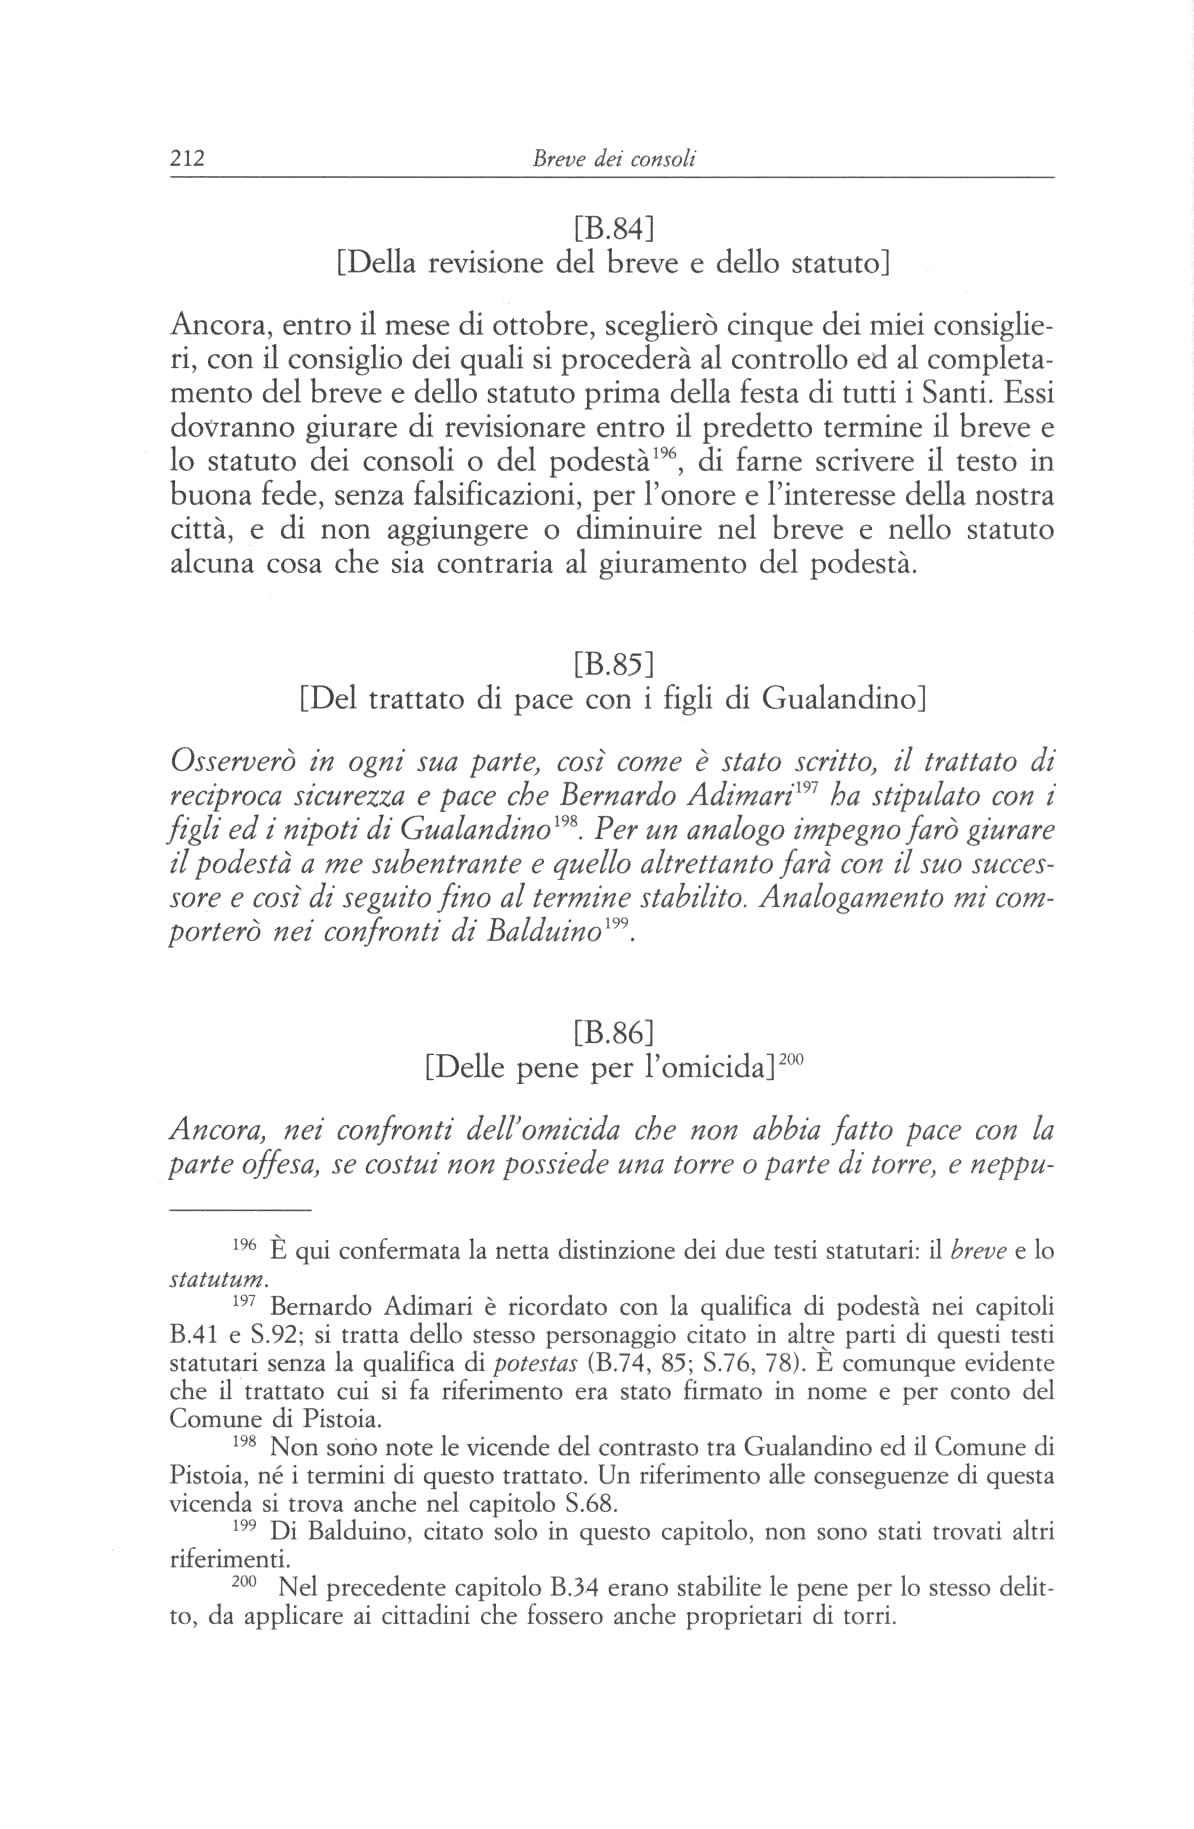 statuti pistoiesi del sec.XII 0212.jpg